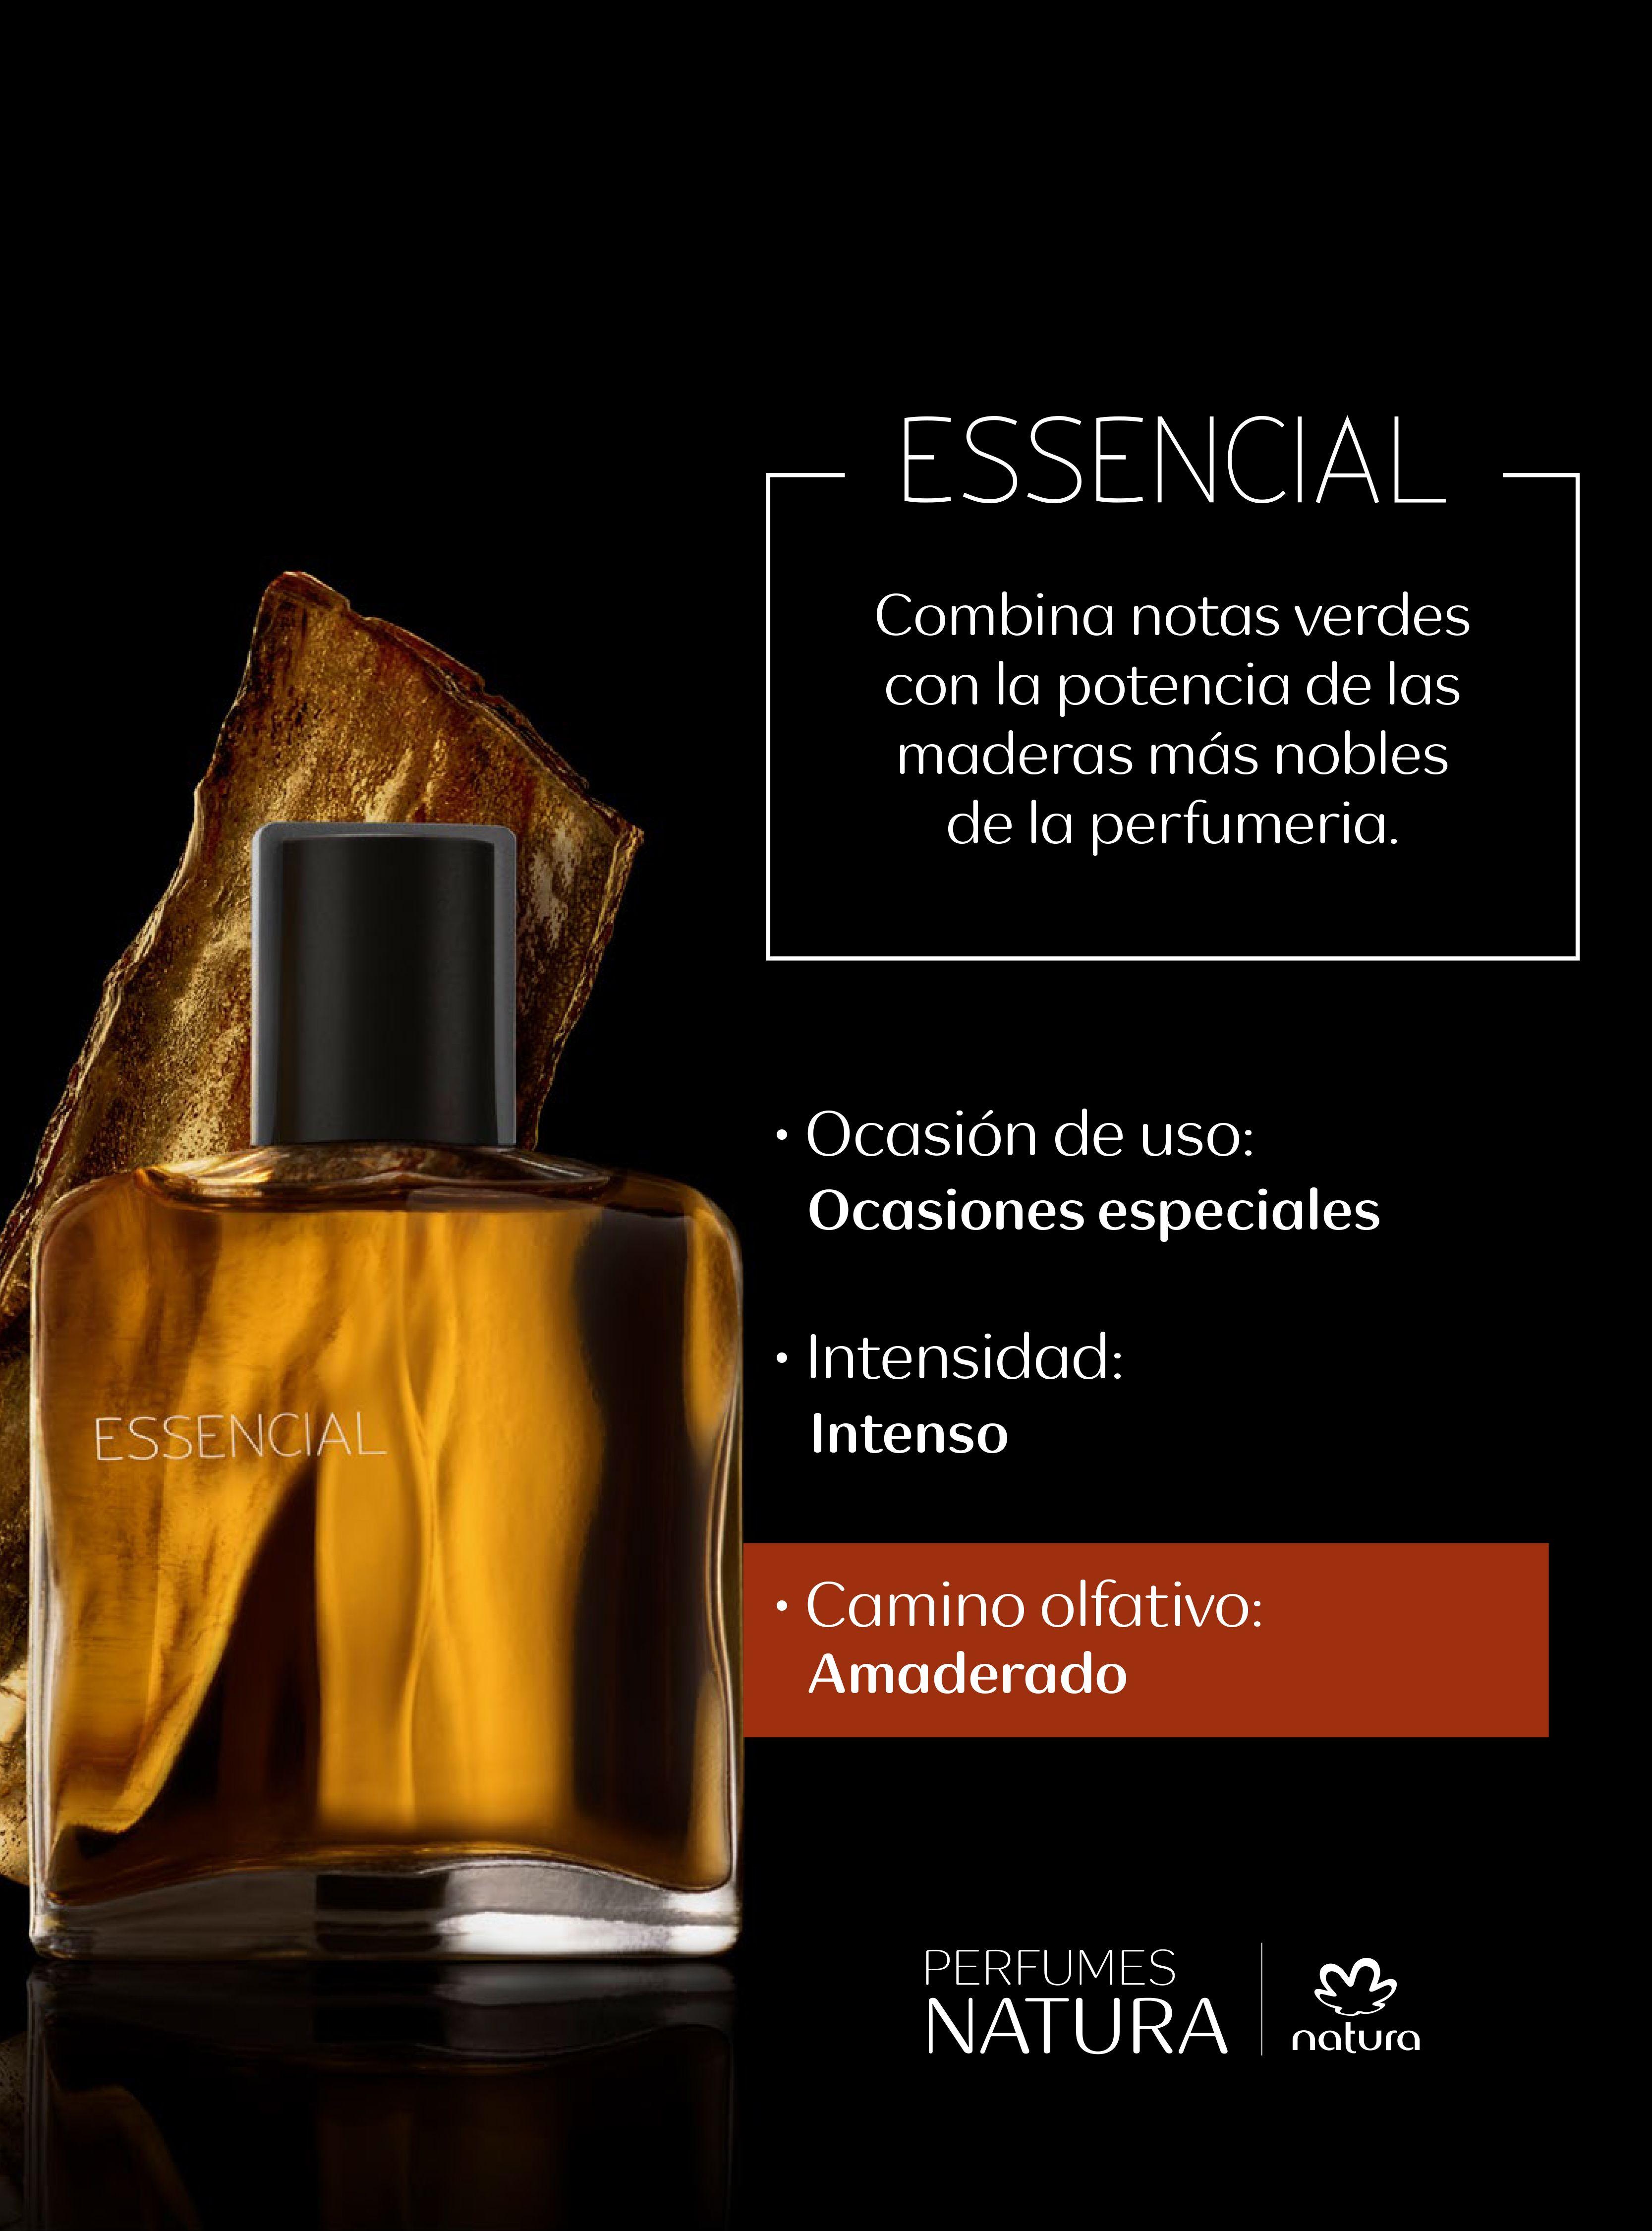 Pin de Dana Popovska en Perfumes/cosmetics/aromatics en